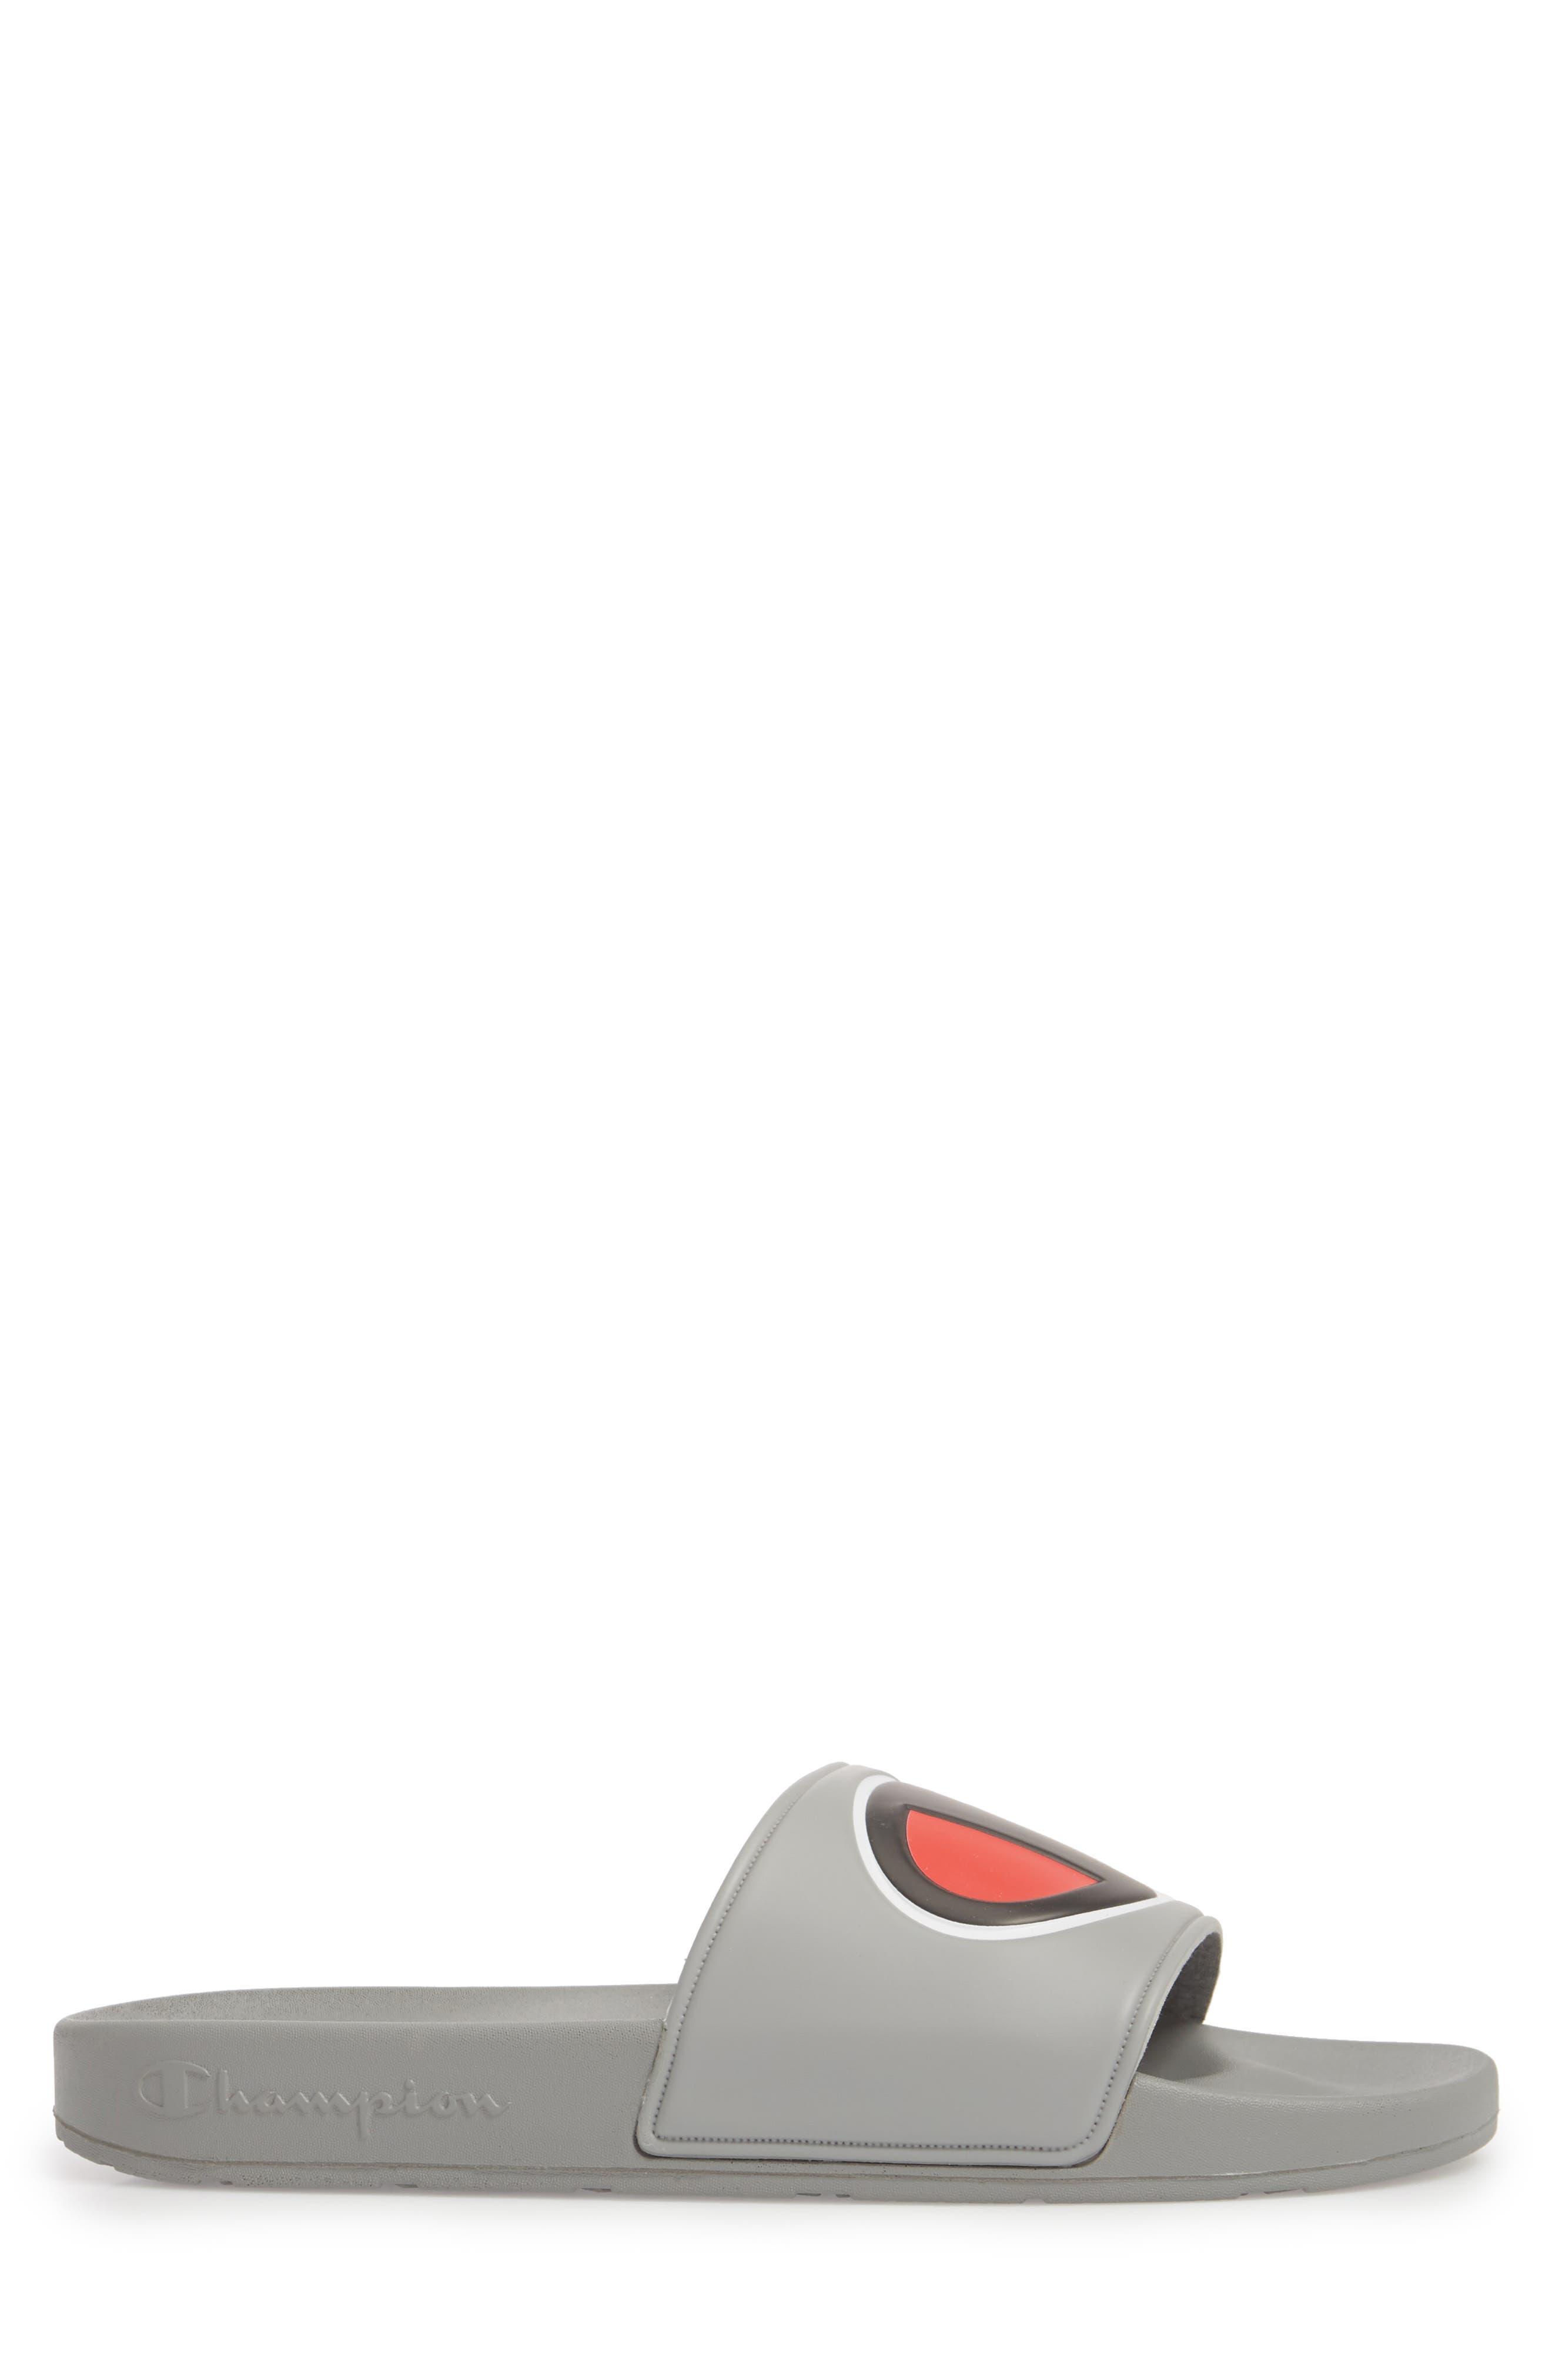 IPO Sports Slide Sandal,                             Alternate thumbnail 3, color,                             GREY